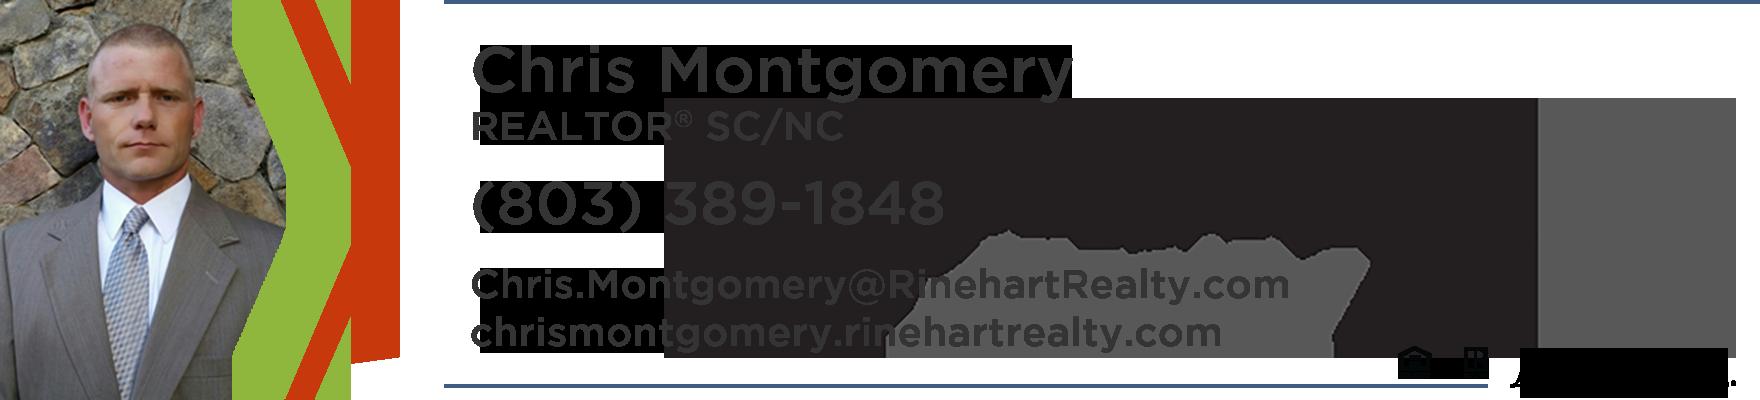 Chris Montgomery REALTOR SC NC